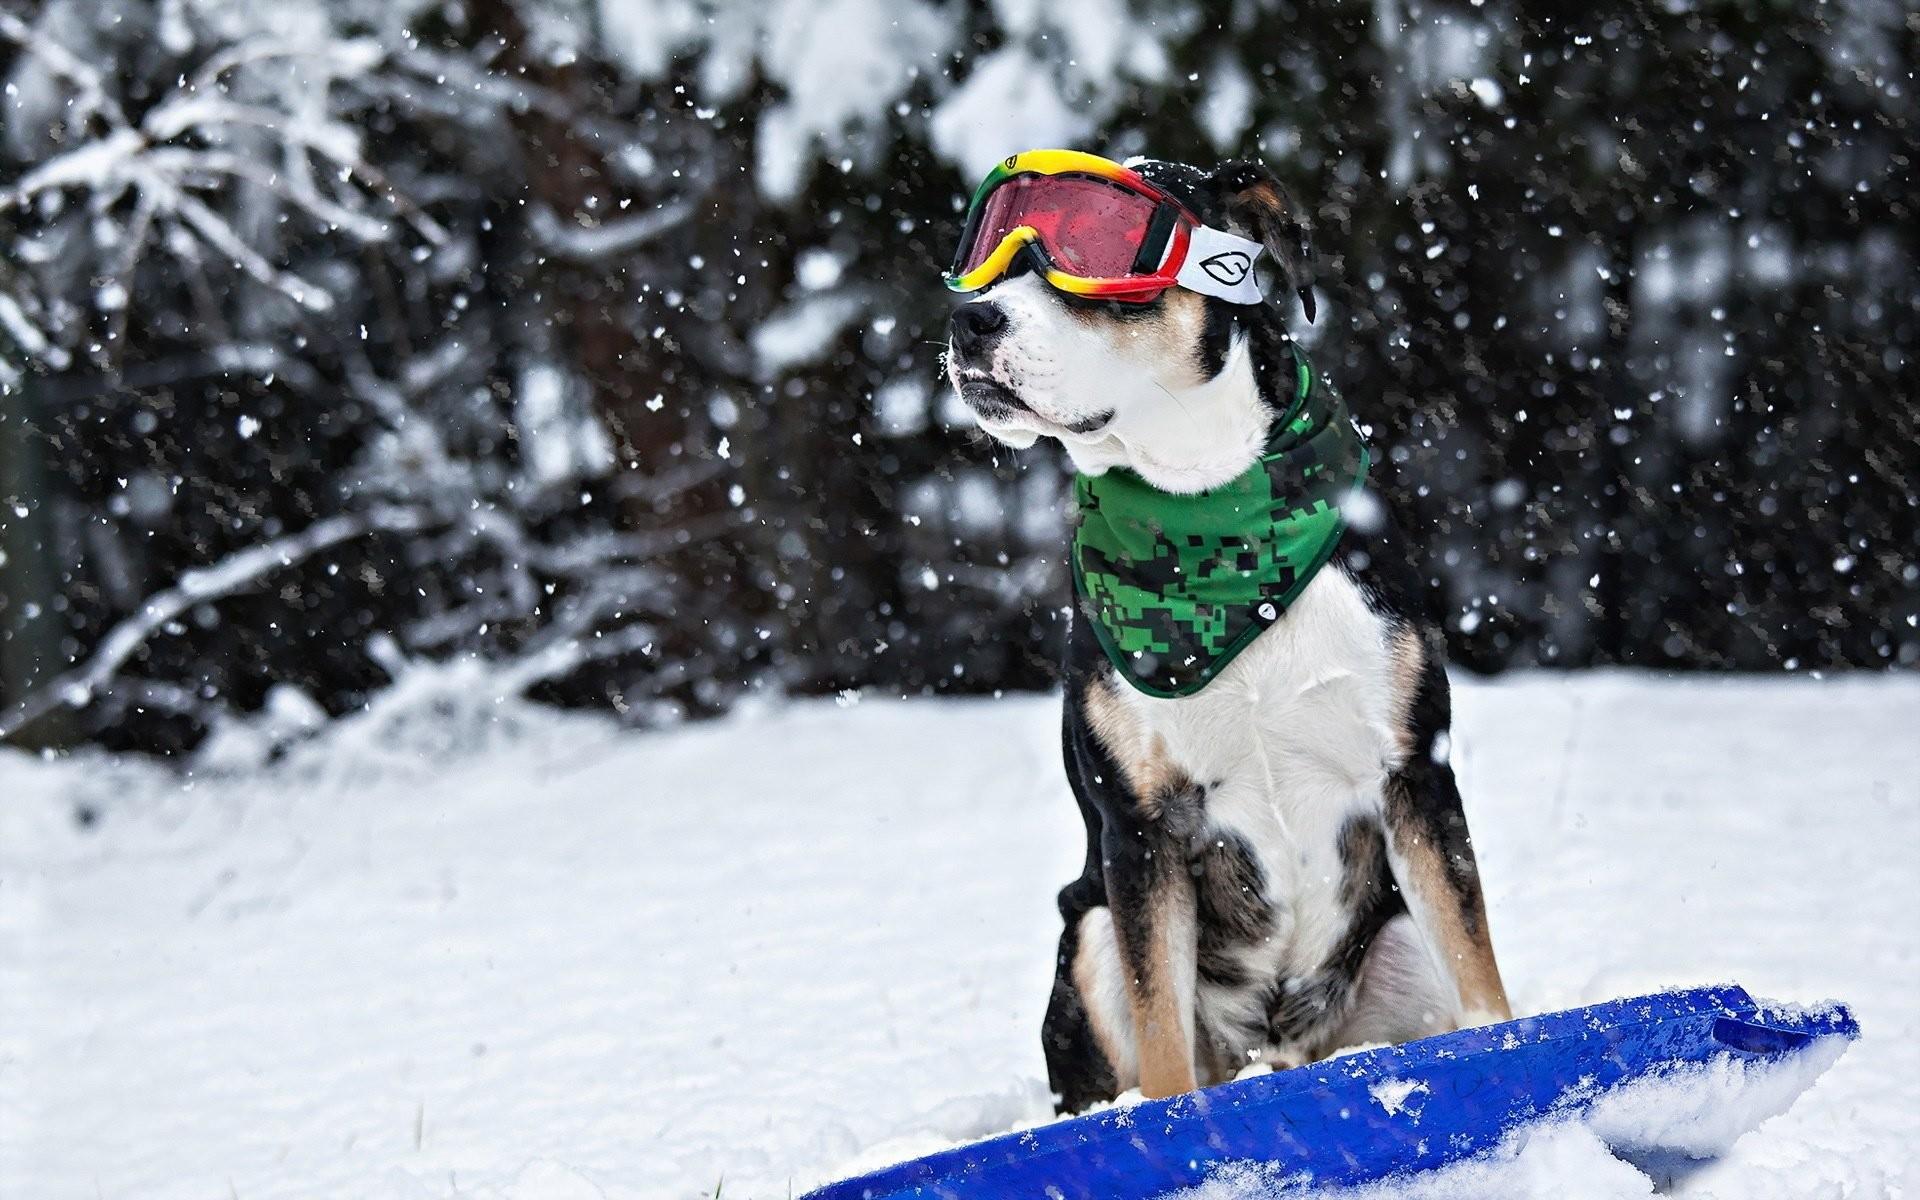 Dog snow winter sled glasses humor funny wallpaper | | 649219 |  WallpaperUP